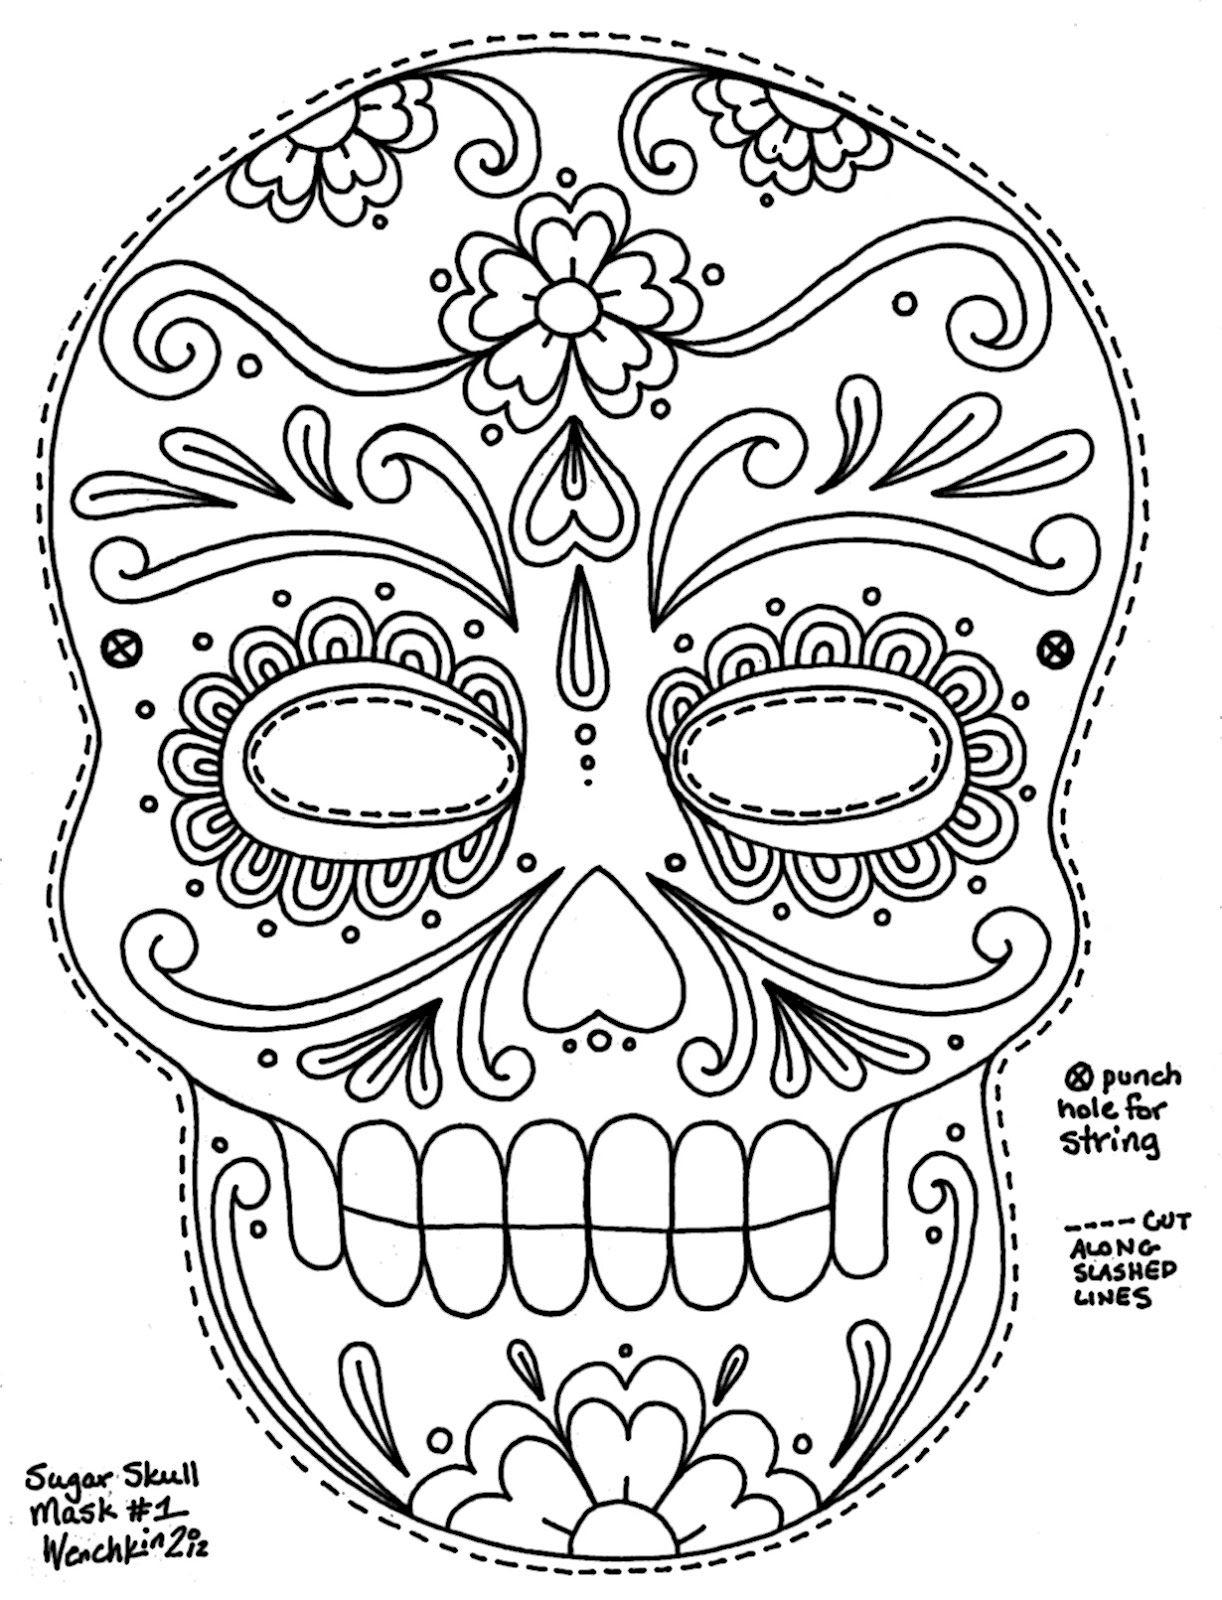 Free Printable Character Face Masks | Seasonal Activities | Skull - Free Printable Face Masks